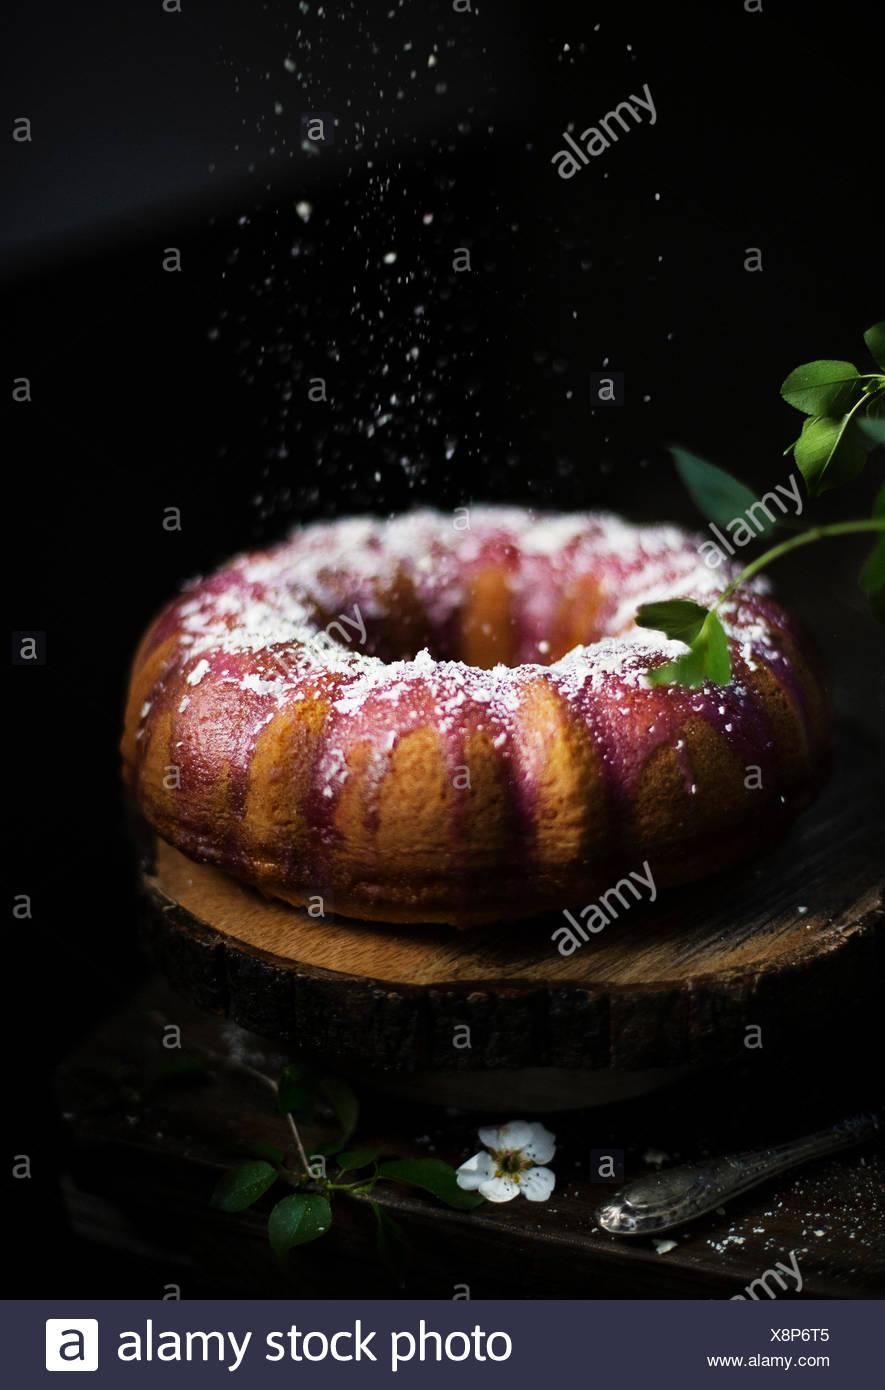 Bundt cake with blackberry glaze and white chocolate flakes - Stock Image